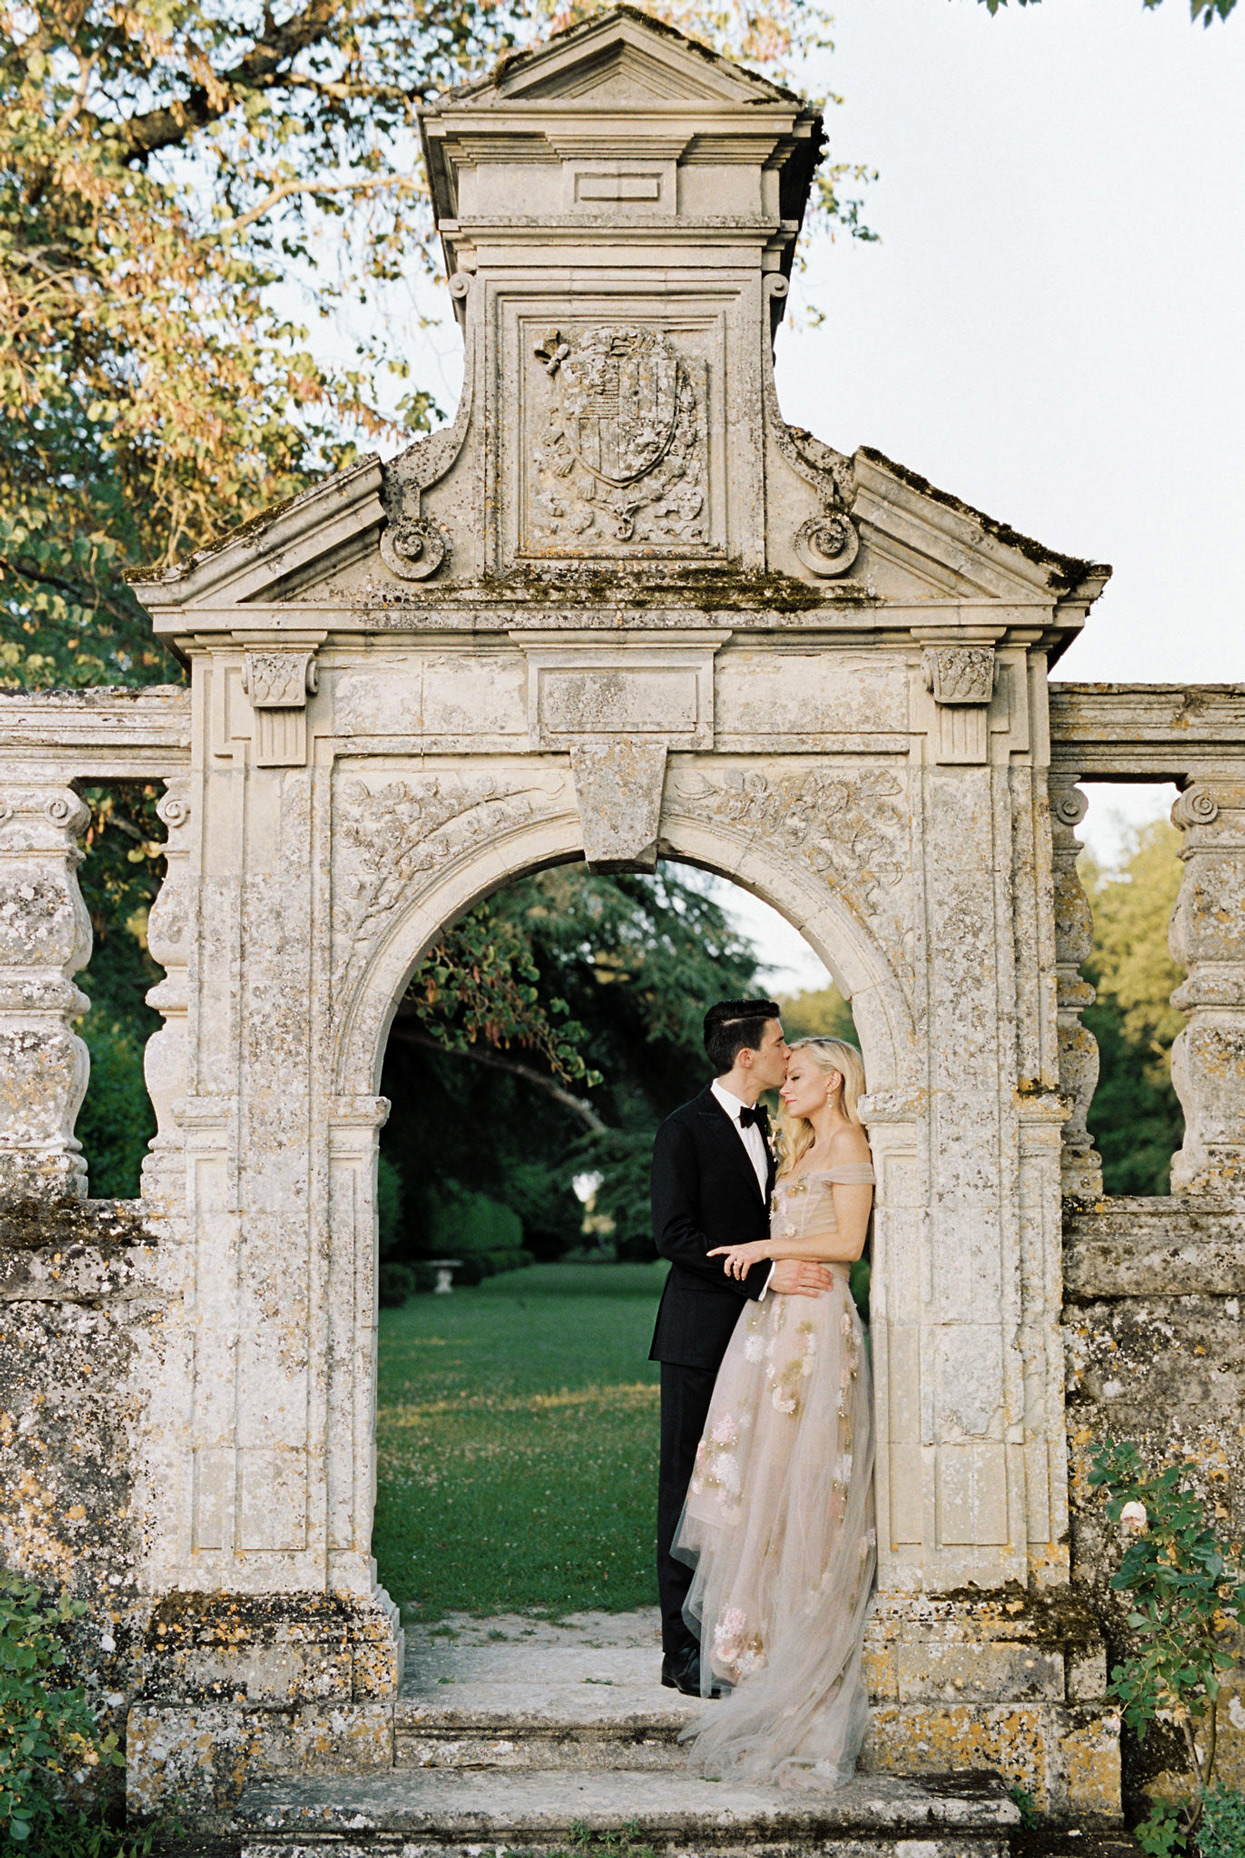 wedding couple under romantic outdoor stone arch